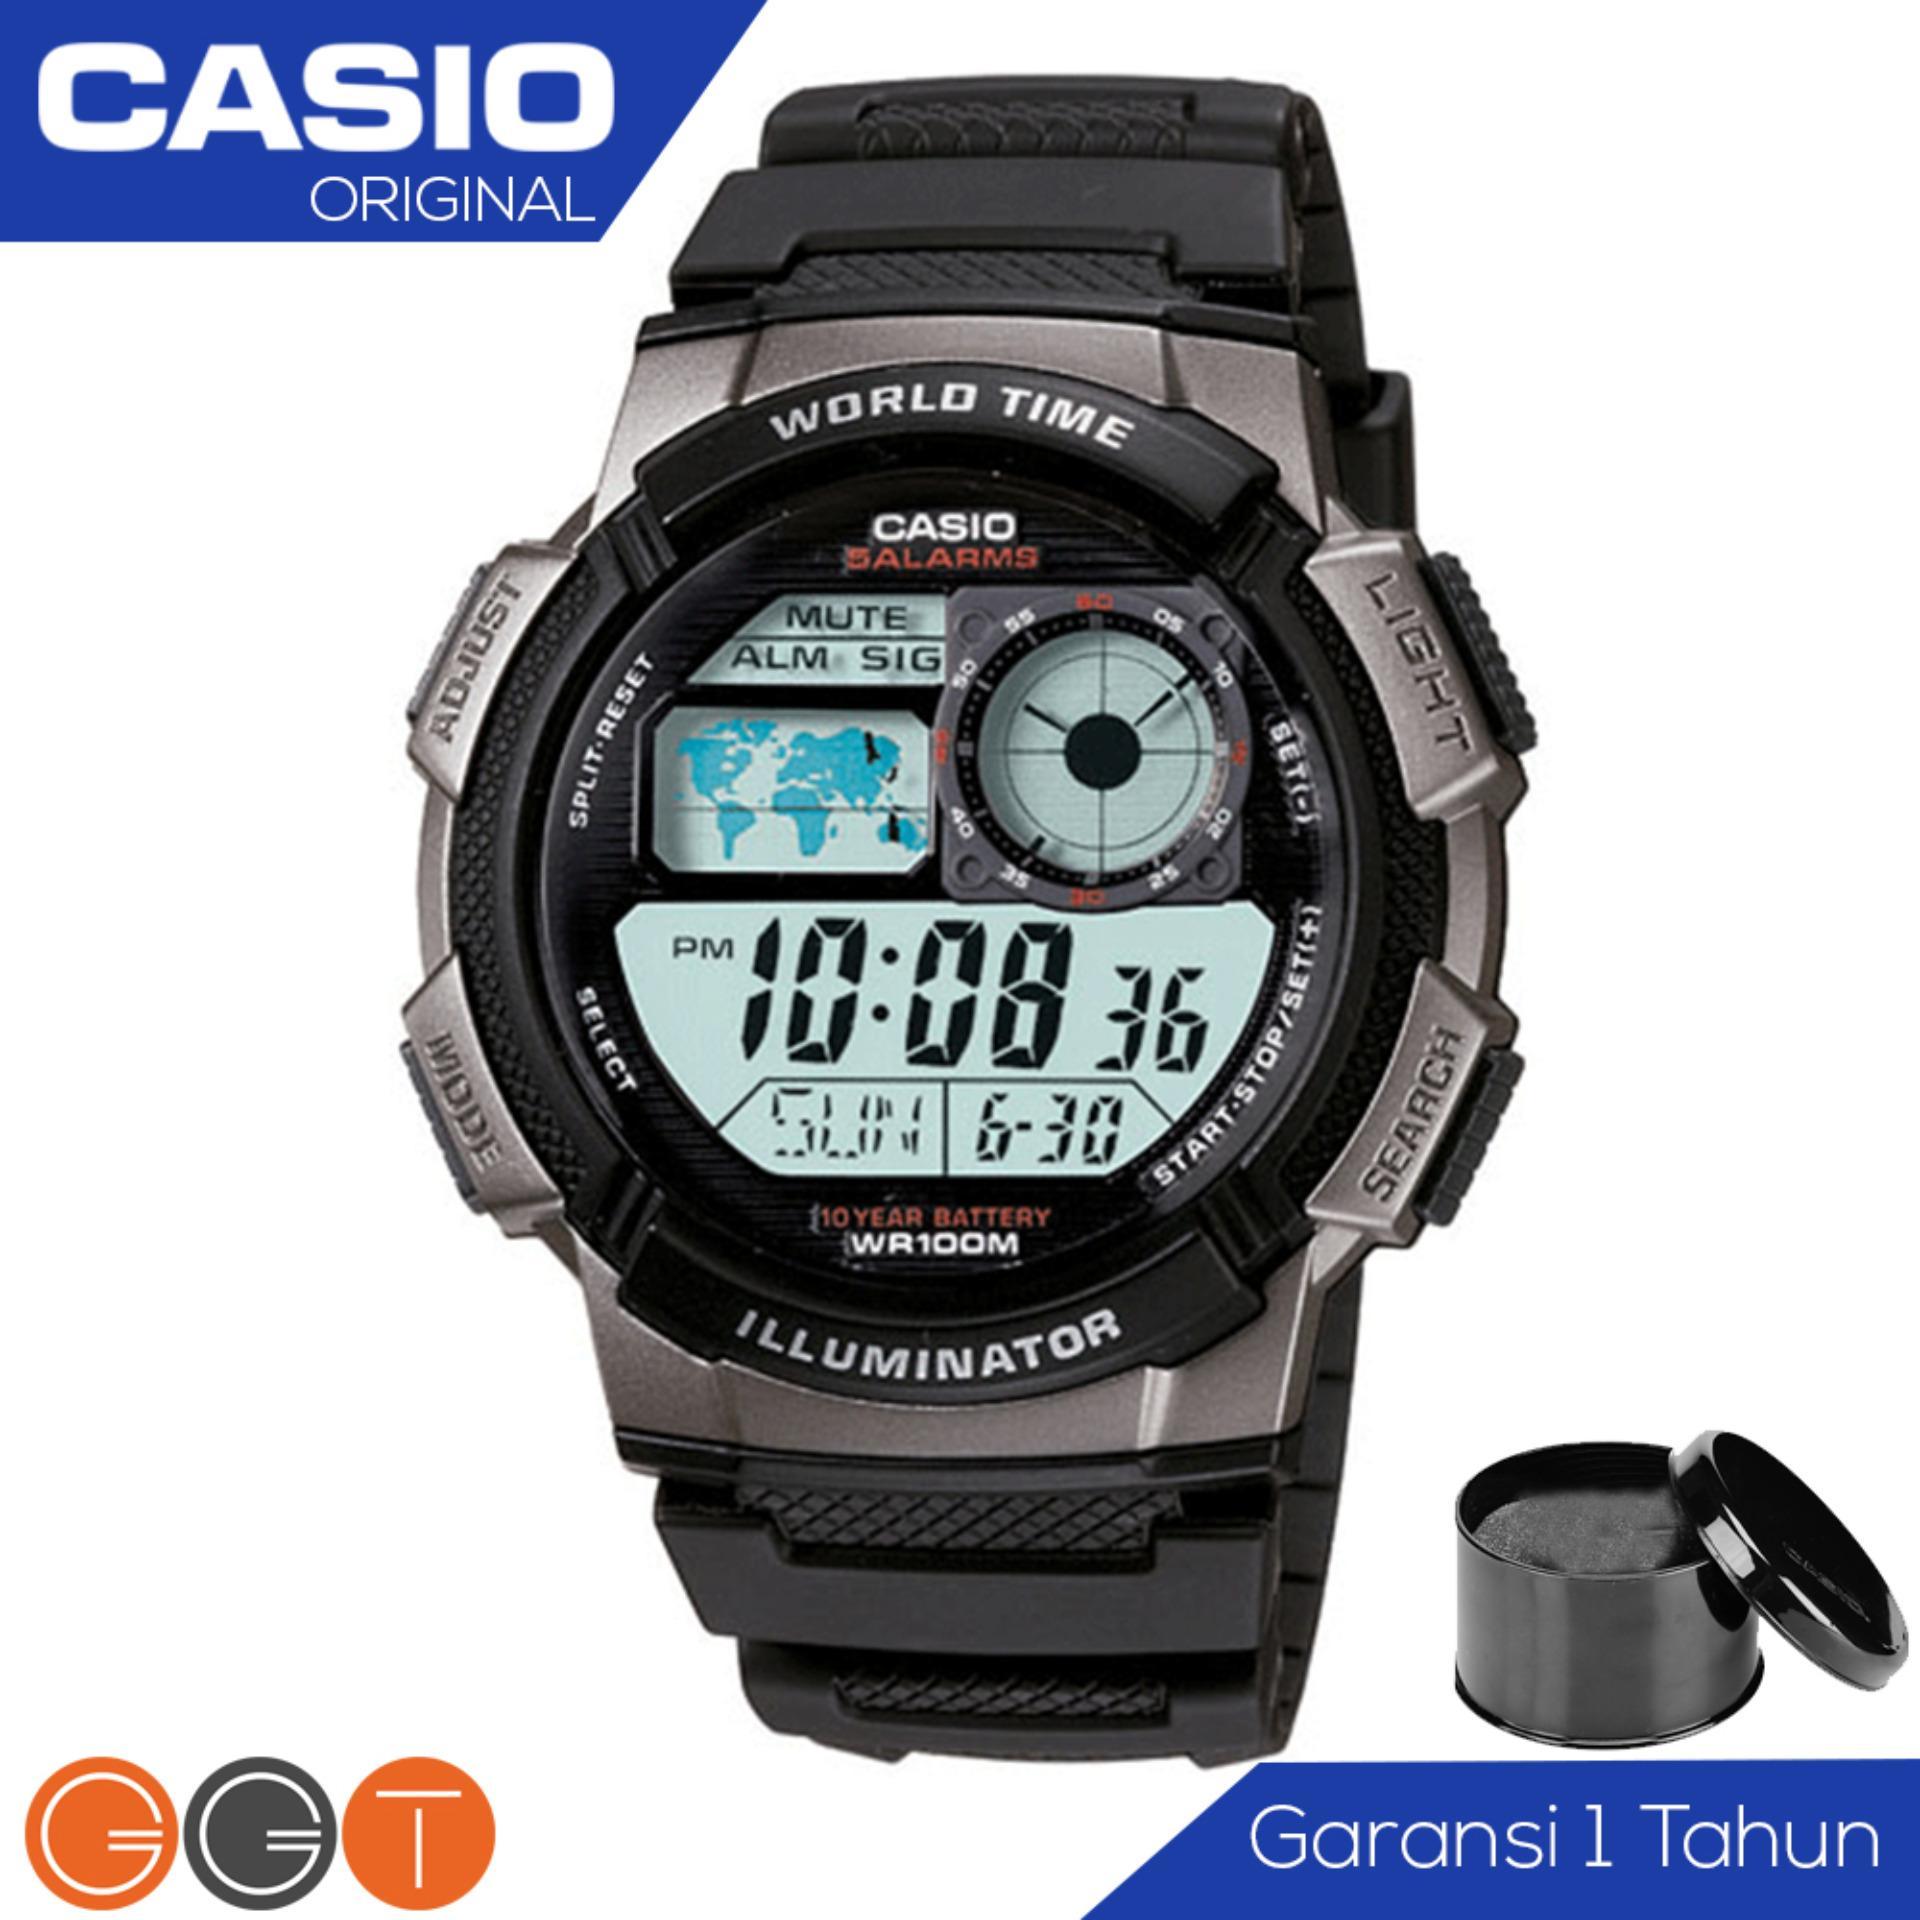 Spesifikasi Casio Illuminator Ae 1000W 1Bvdf Jam Tangan Pria Tali Karet Digital Movement Hitam Silver Lengkap